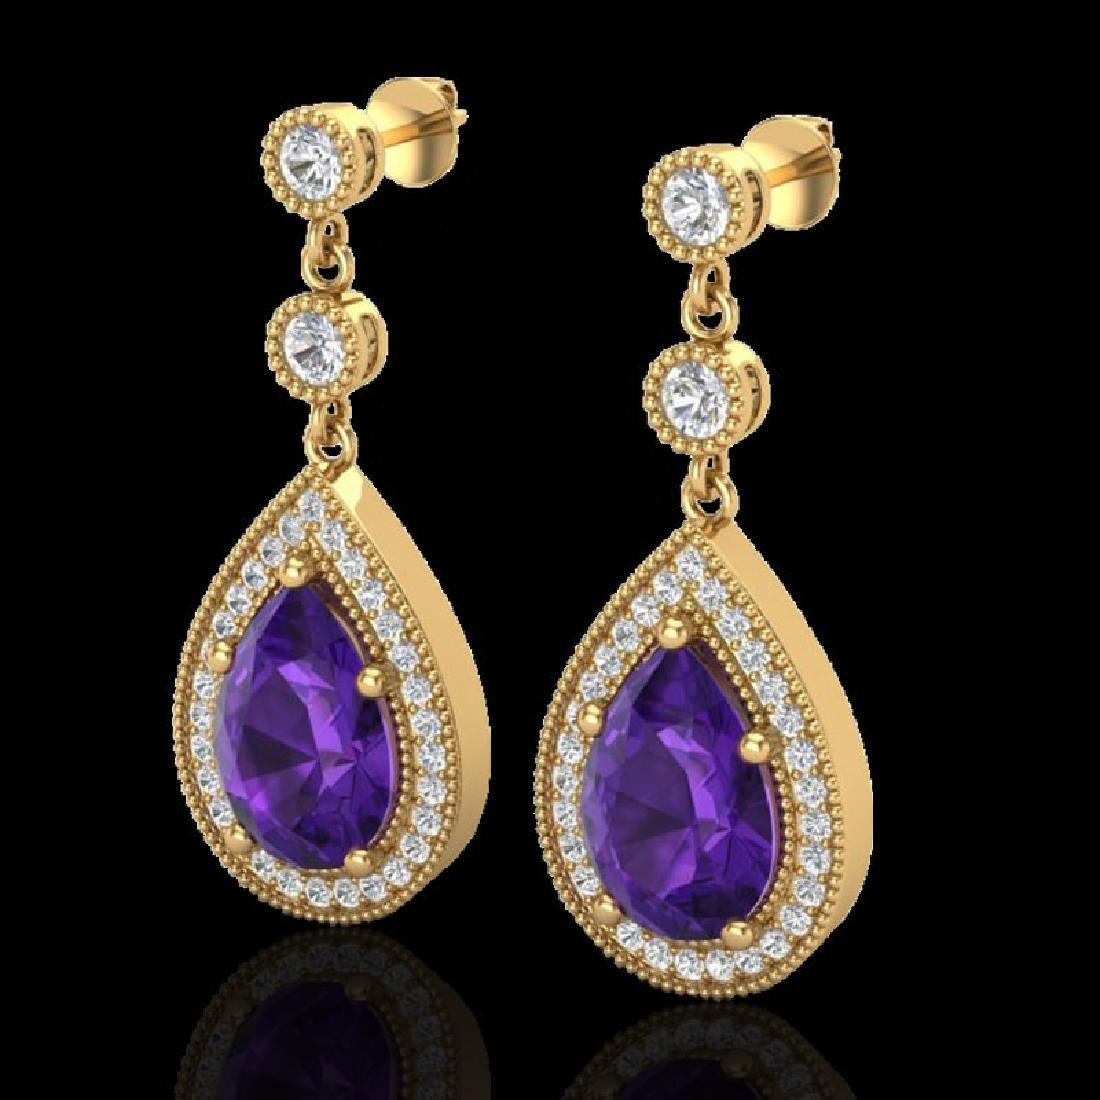 4.50 CTW Amethyst & Micro Pave VS/SI Diamond Earrings